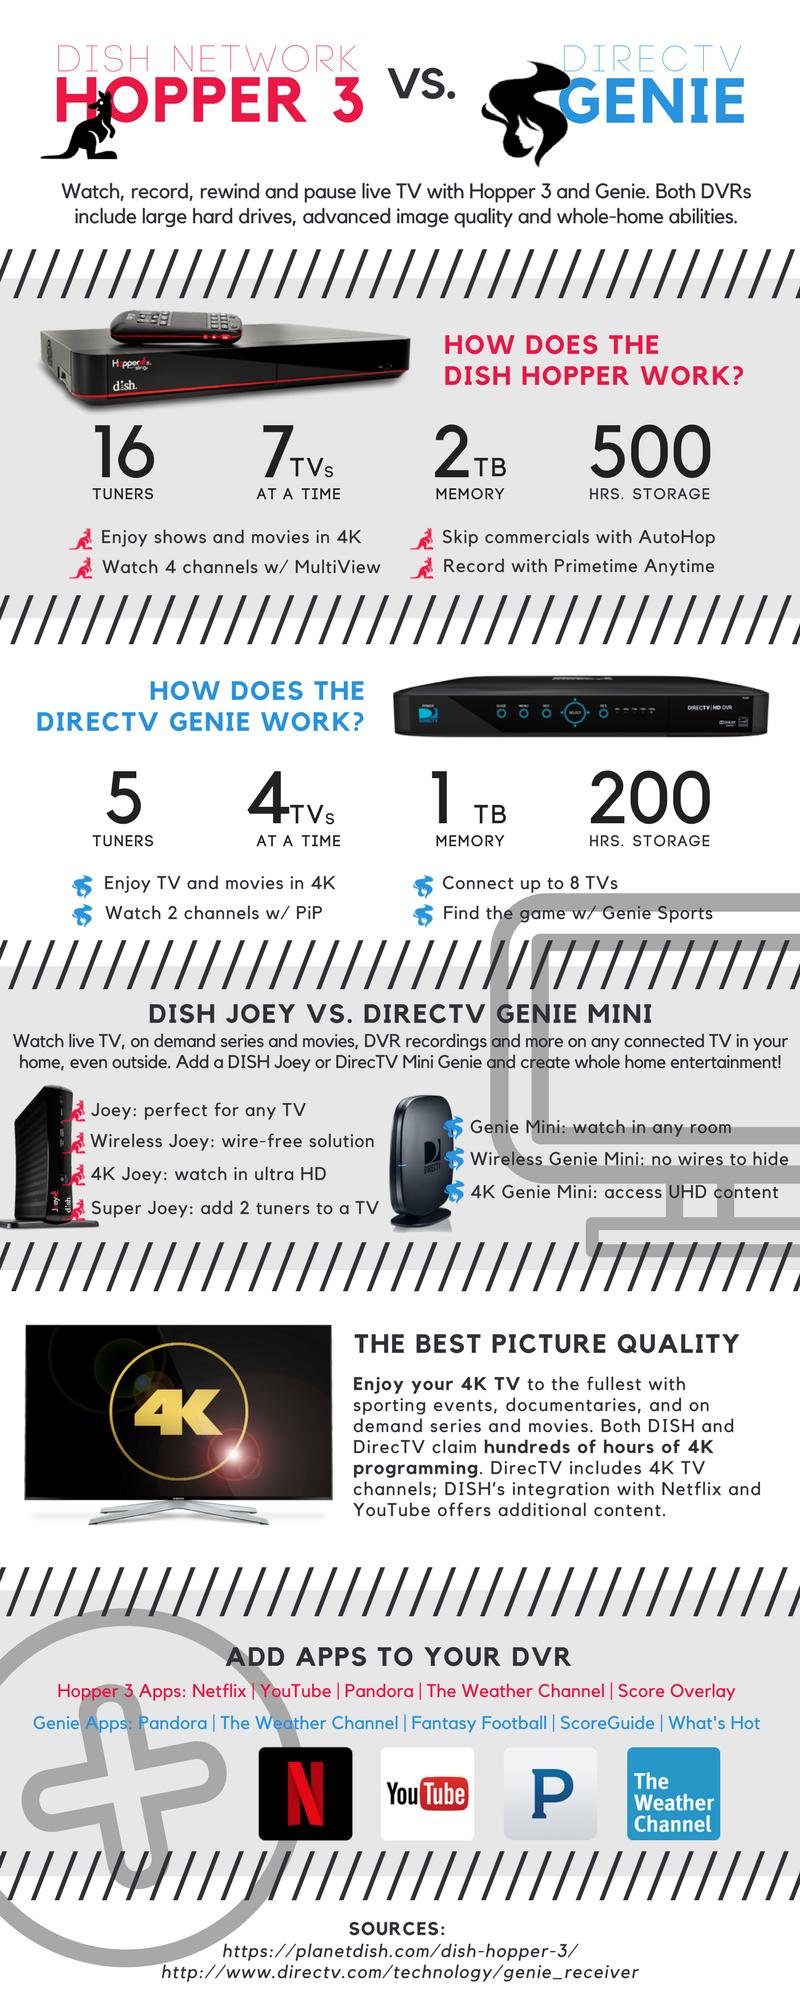 DISH Hopper vs. DirecTV Genie